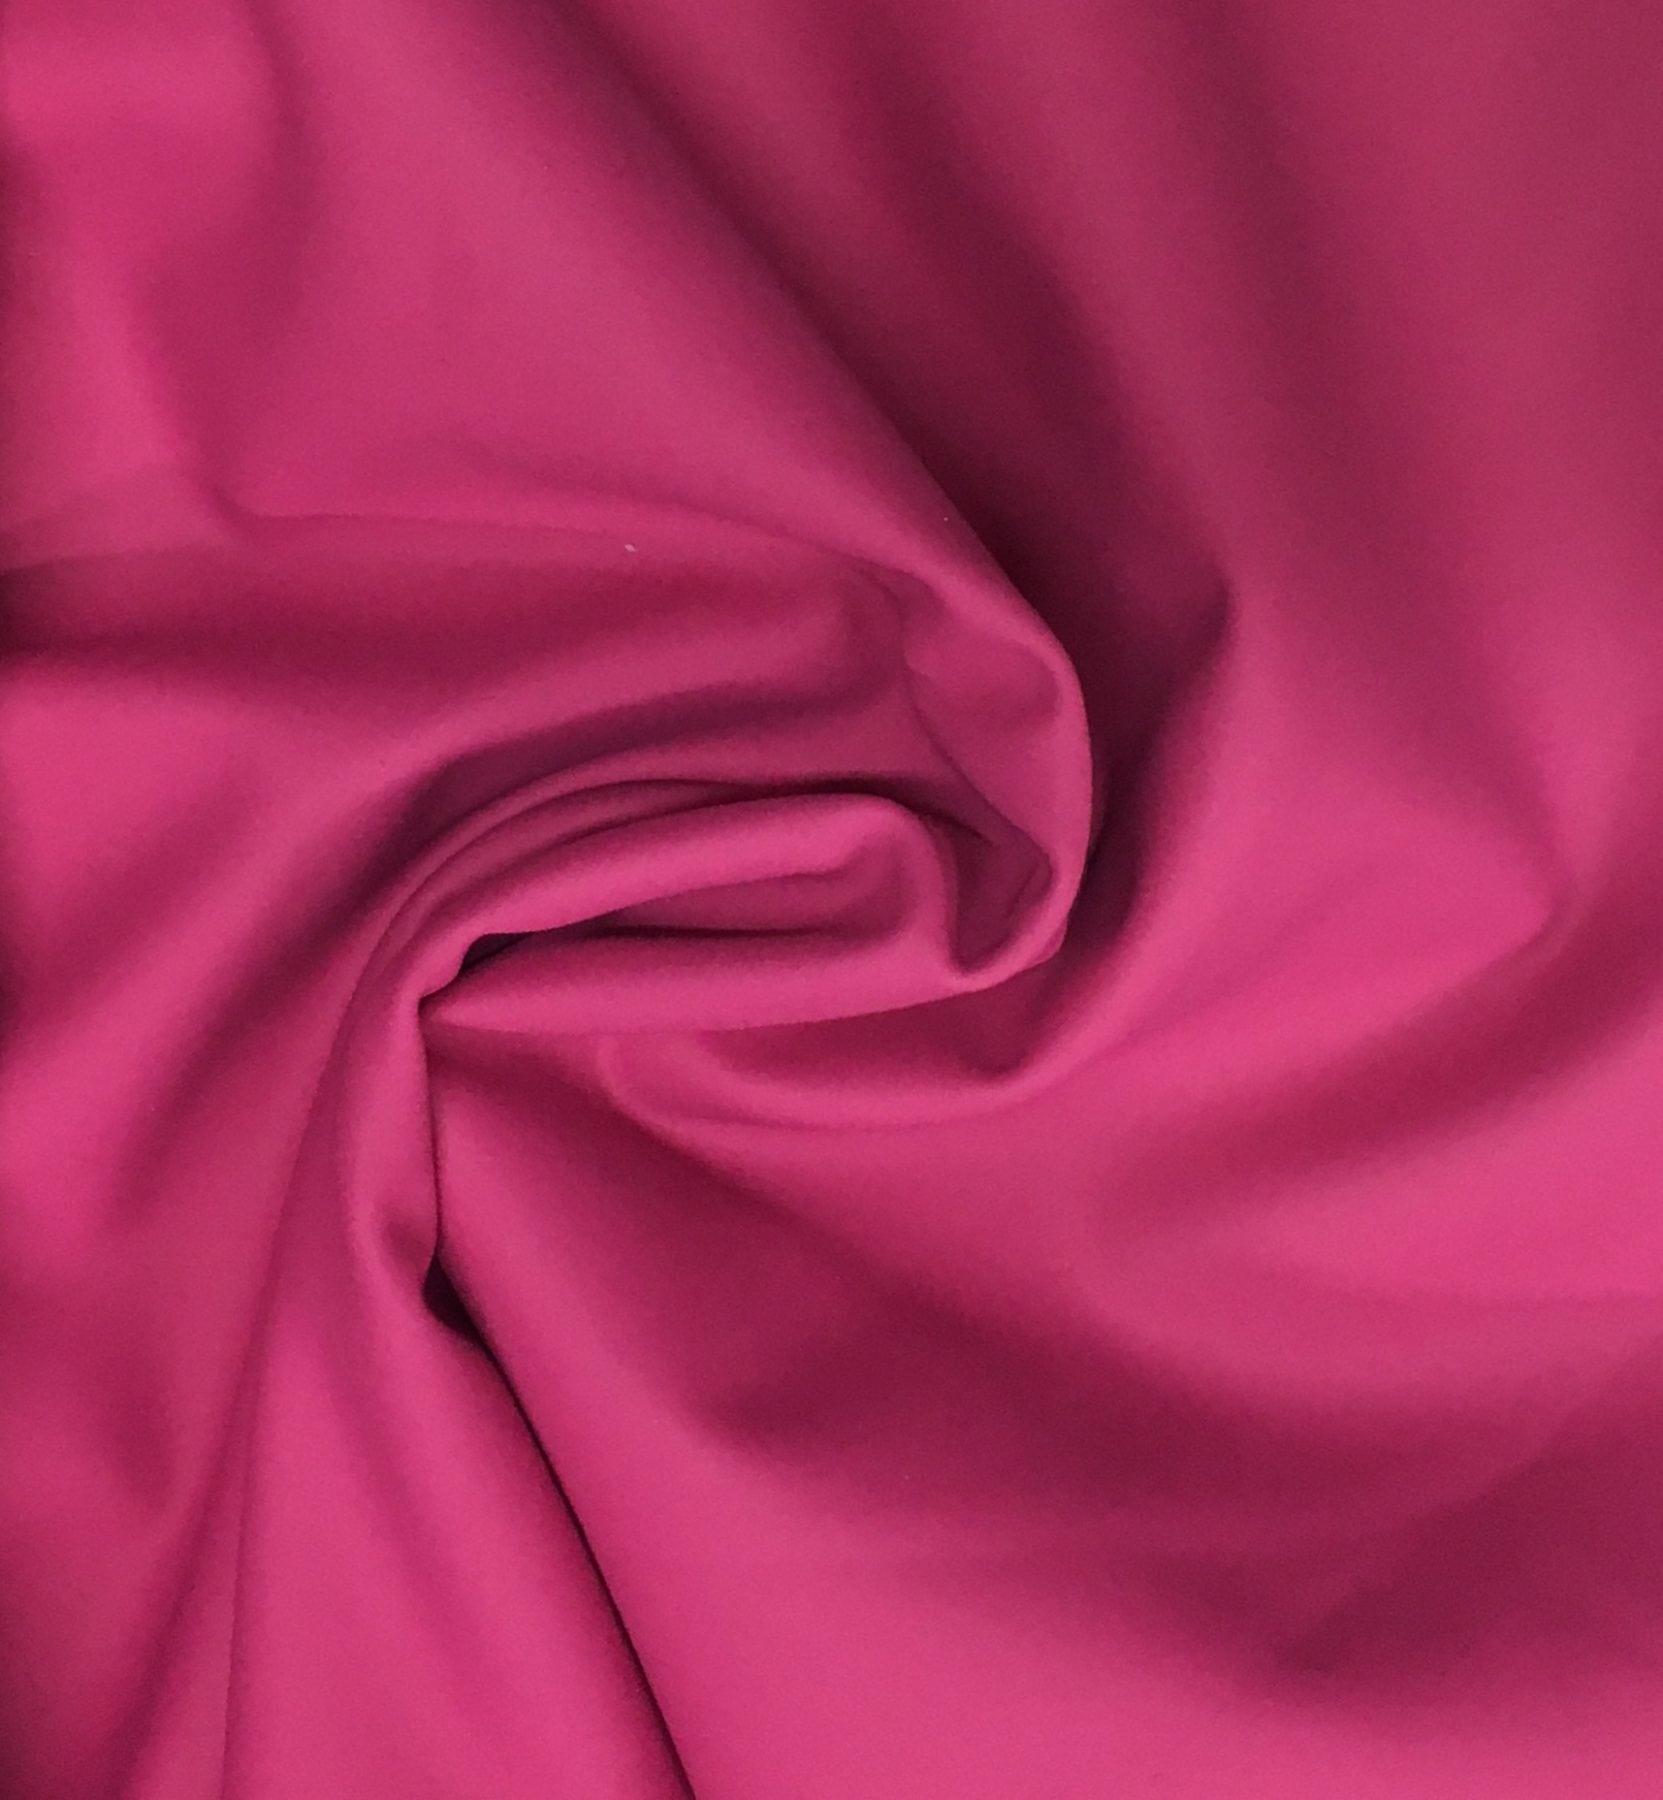 Pink PU Coating Spandex, Pink fabric, pink spandex, Polyurethane fabric, PU fabric